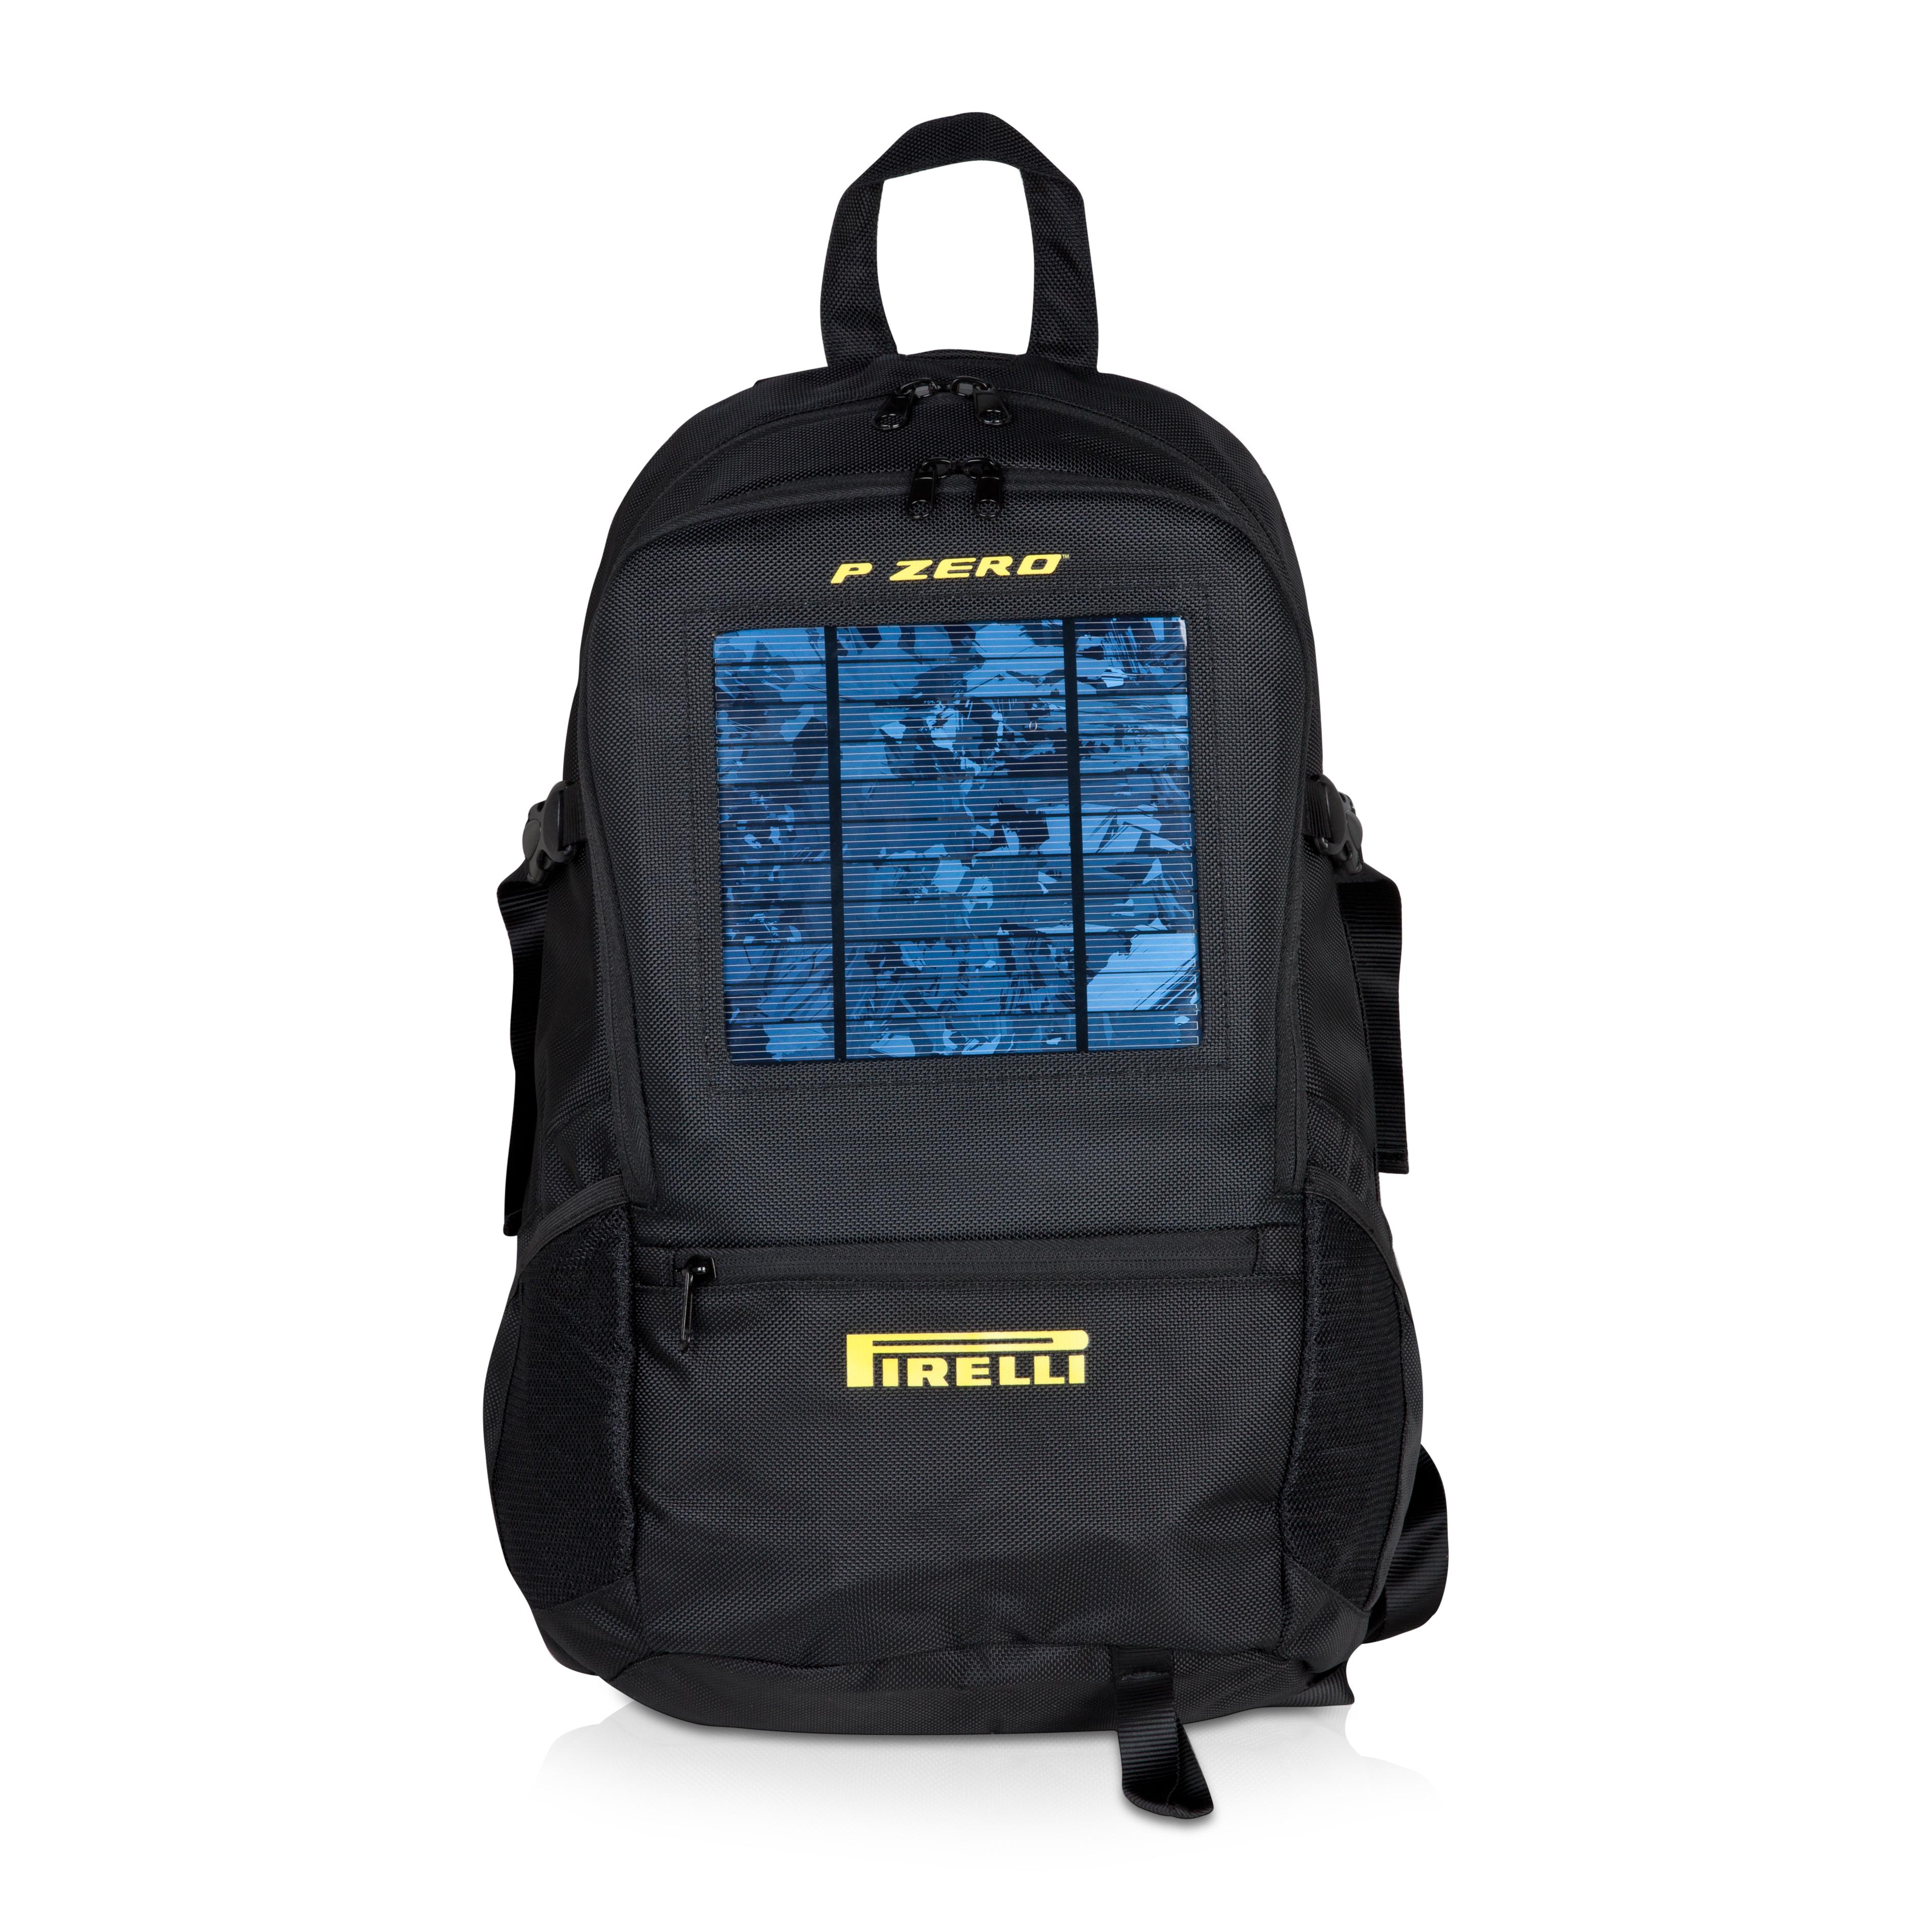 Pirelli Solar Backpack